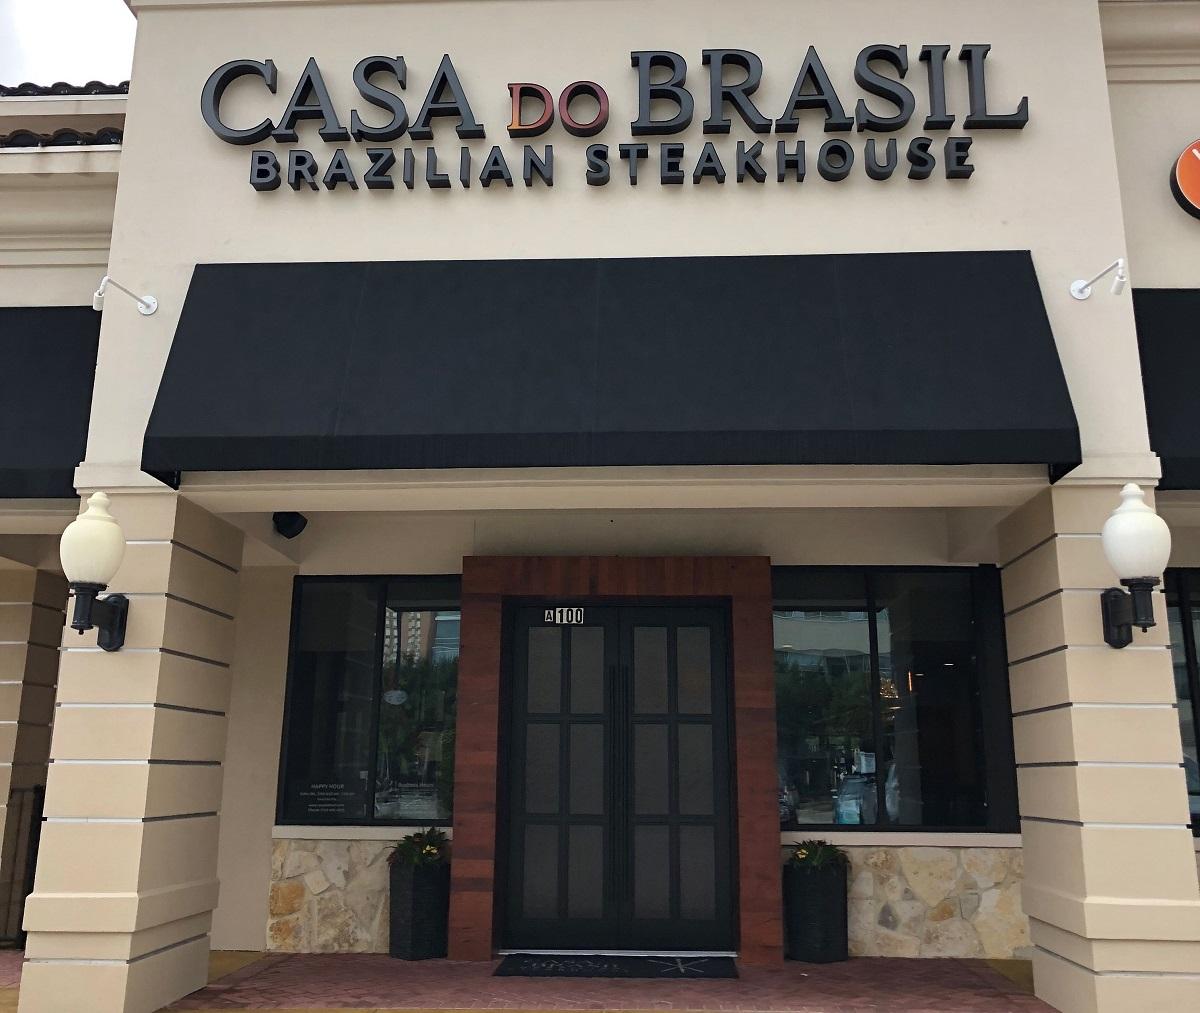 Exterior of Casa Do Brasil restaurant